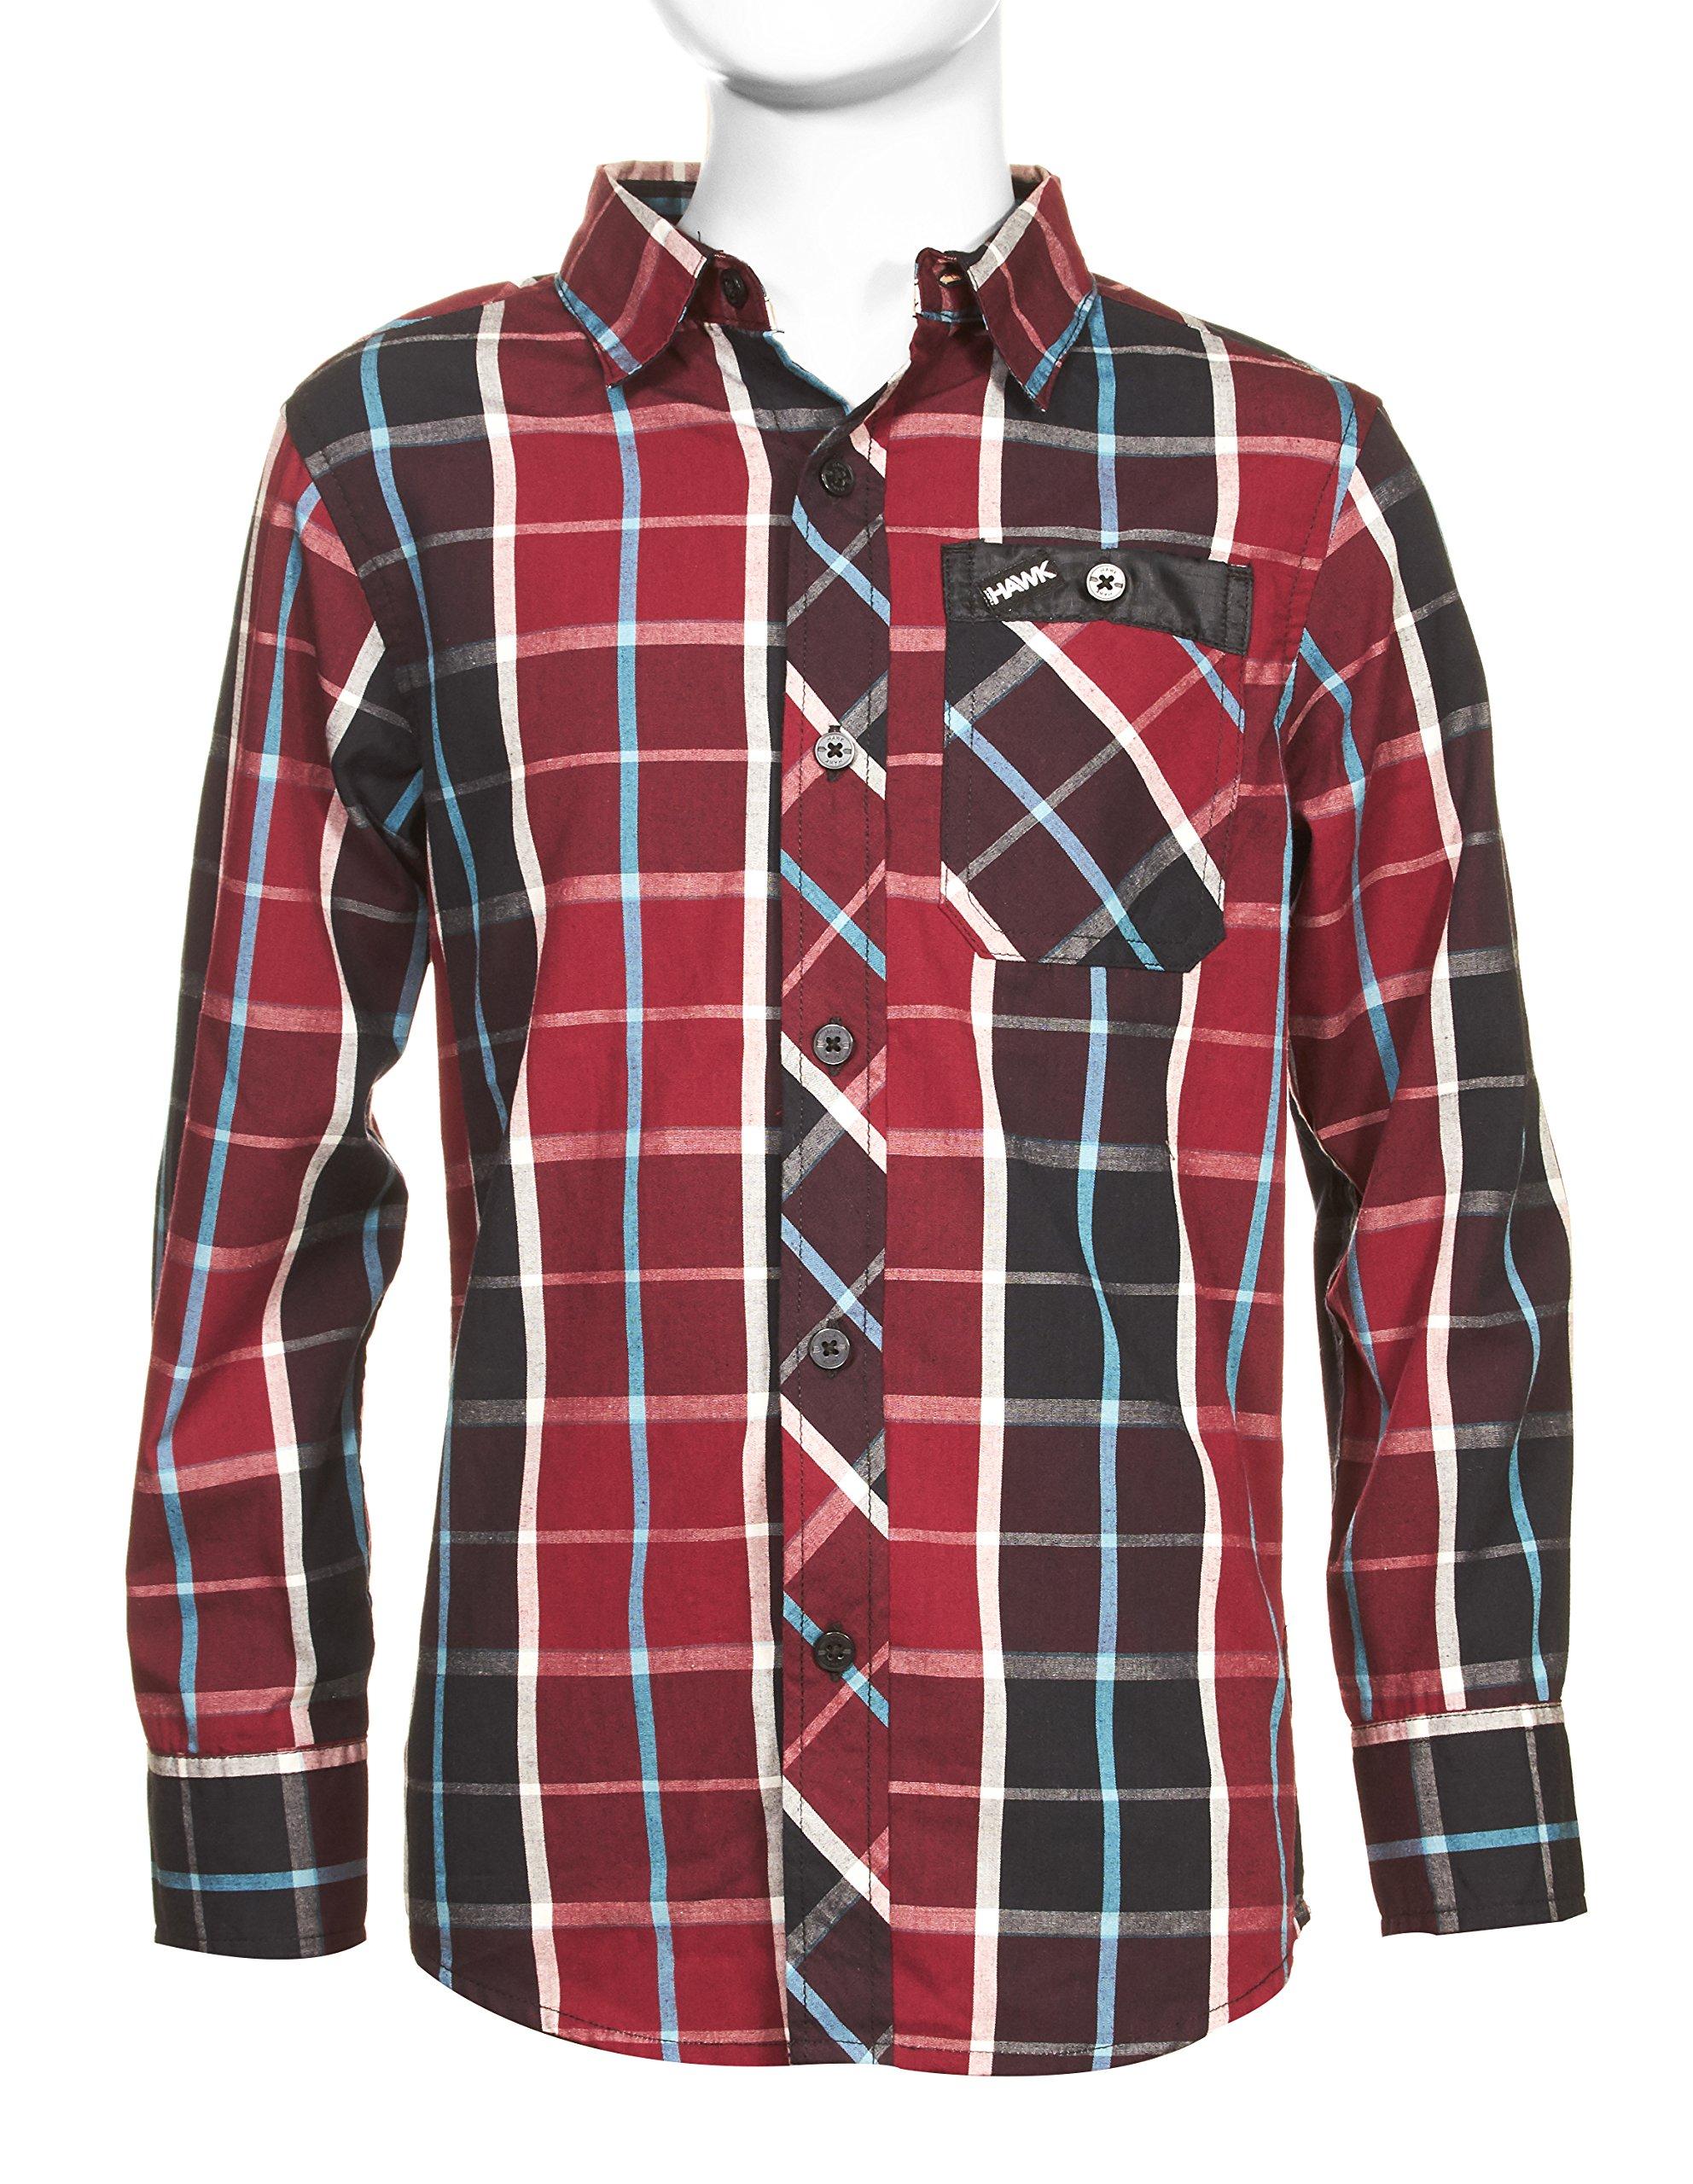 Tony Hawk Boys Long Sleeve Button Down Plaid Shirt RED 10/12